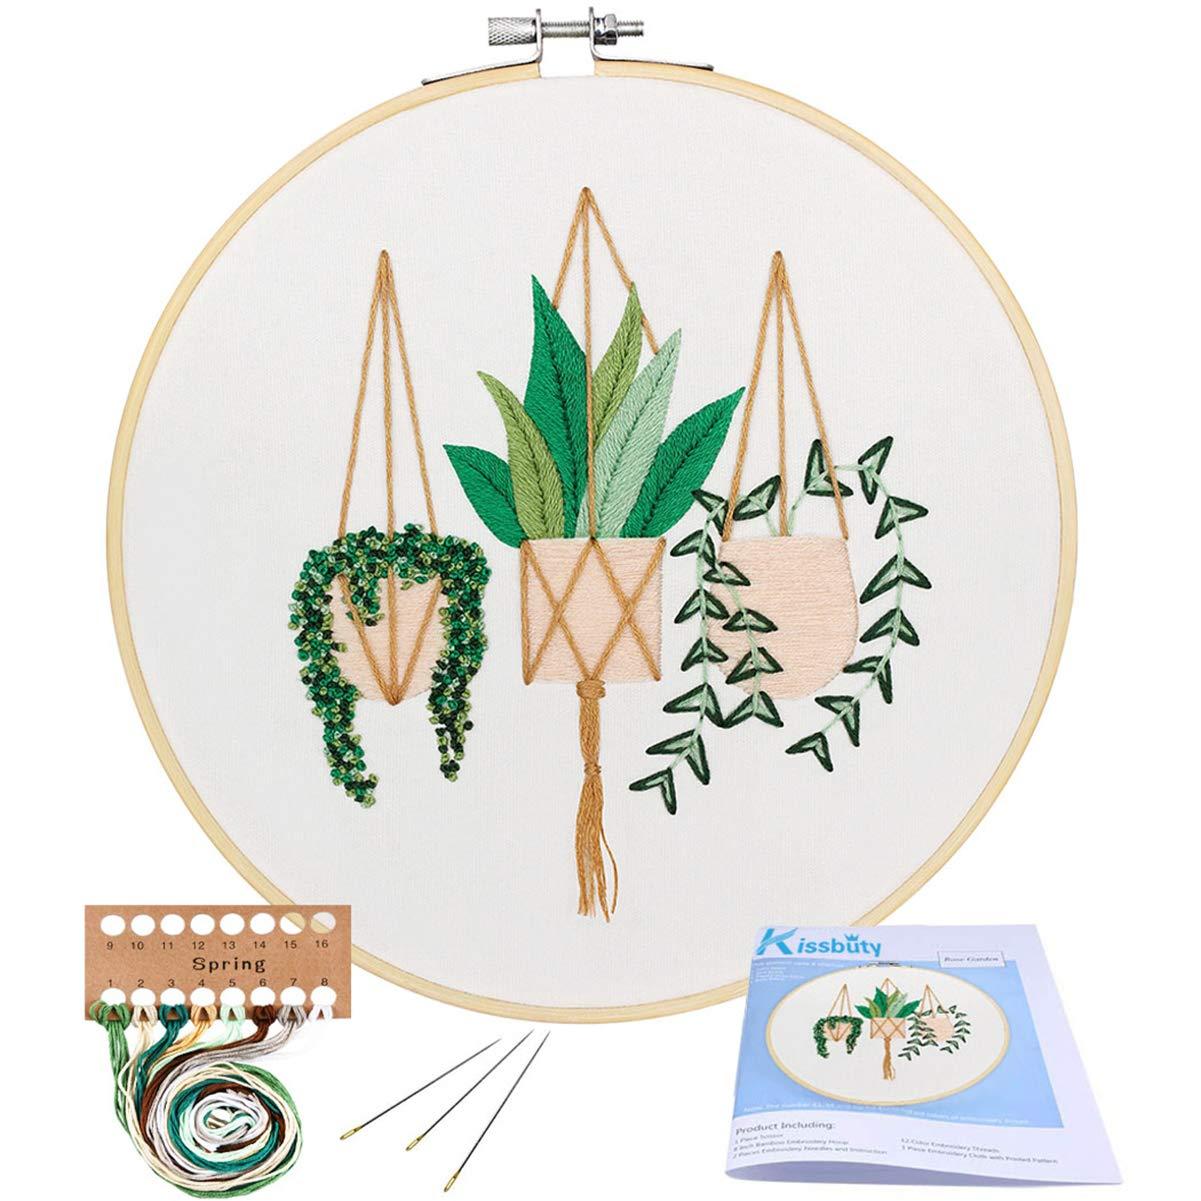 Embroidery Starter Kissbuty Including Epipremnum